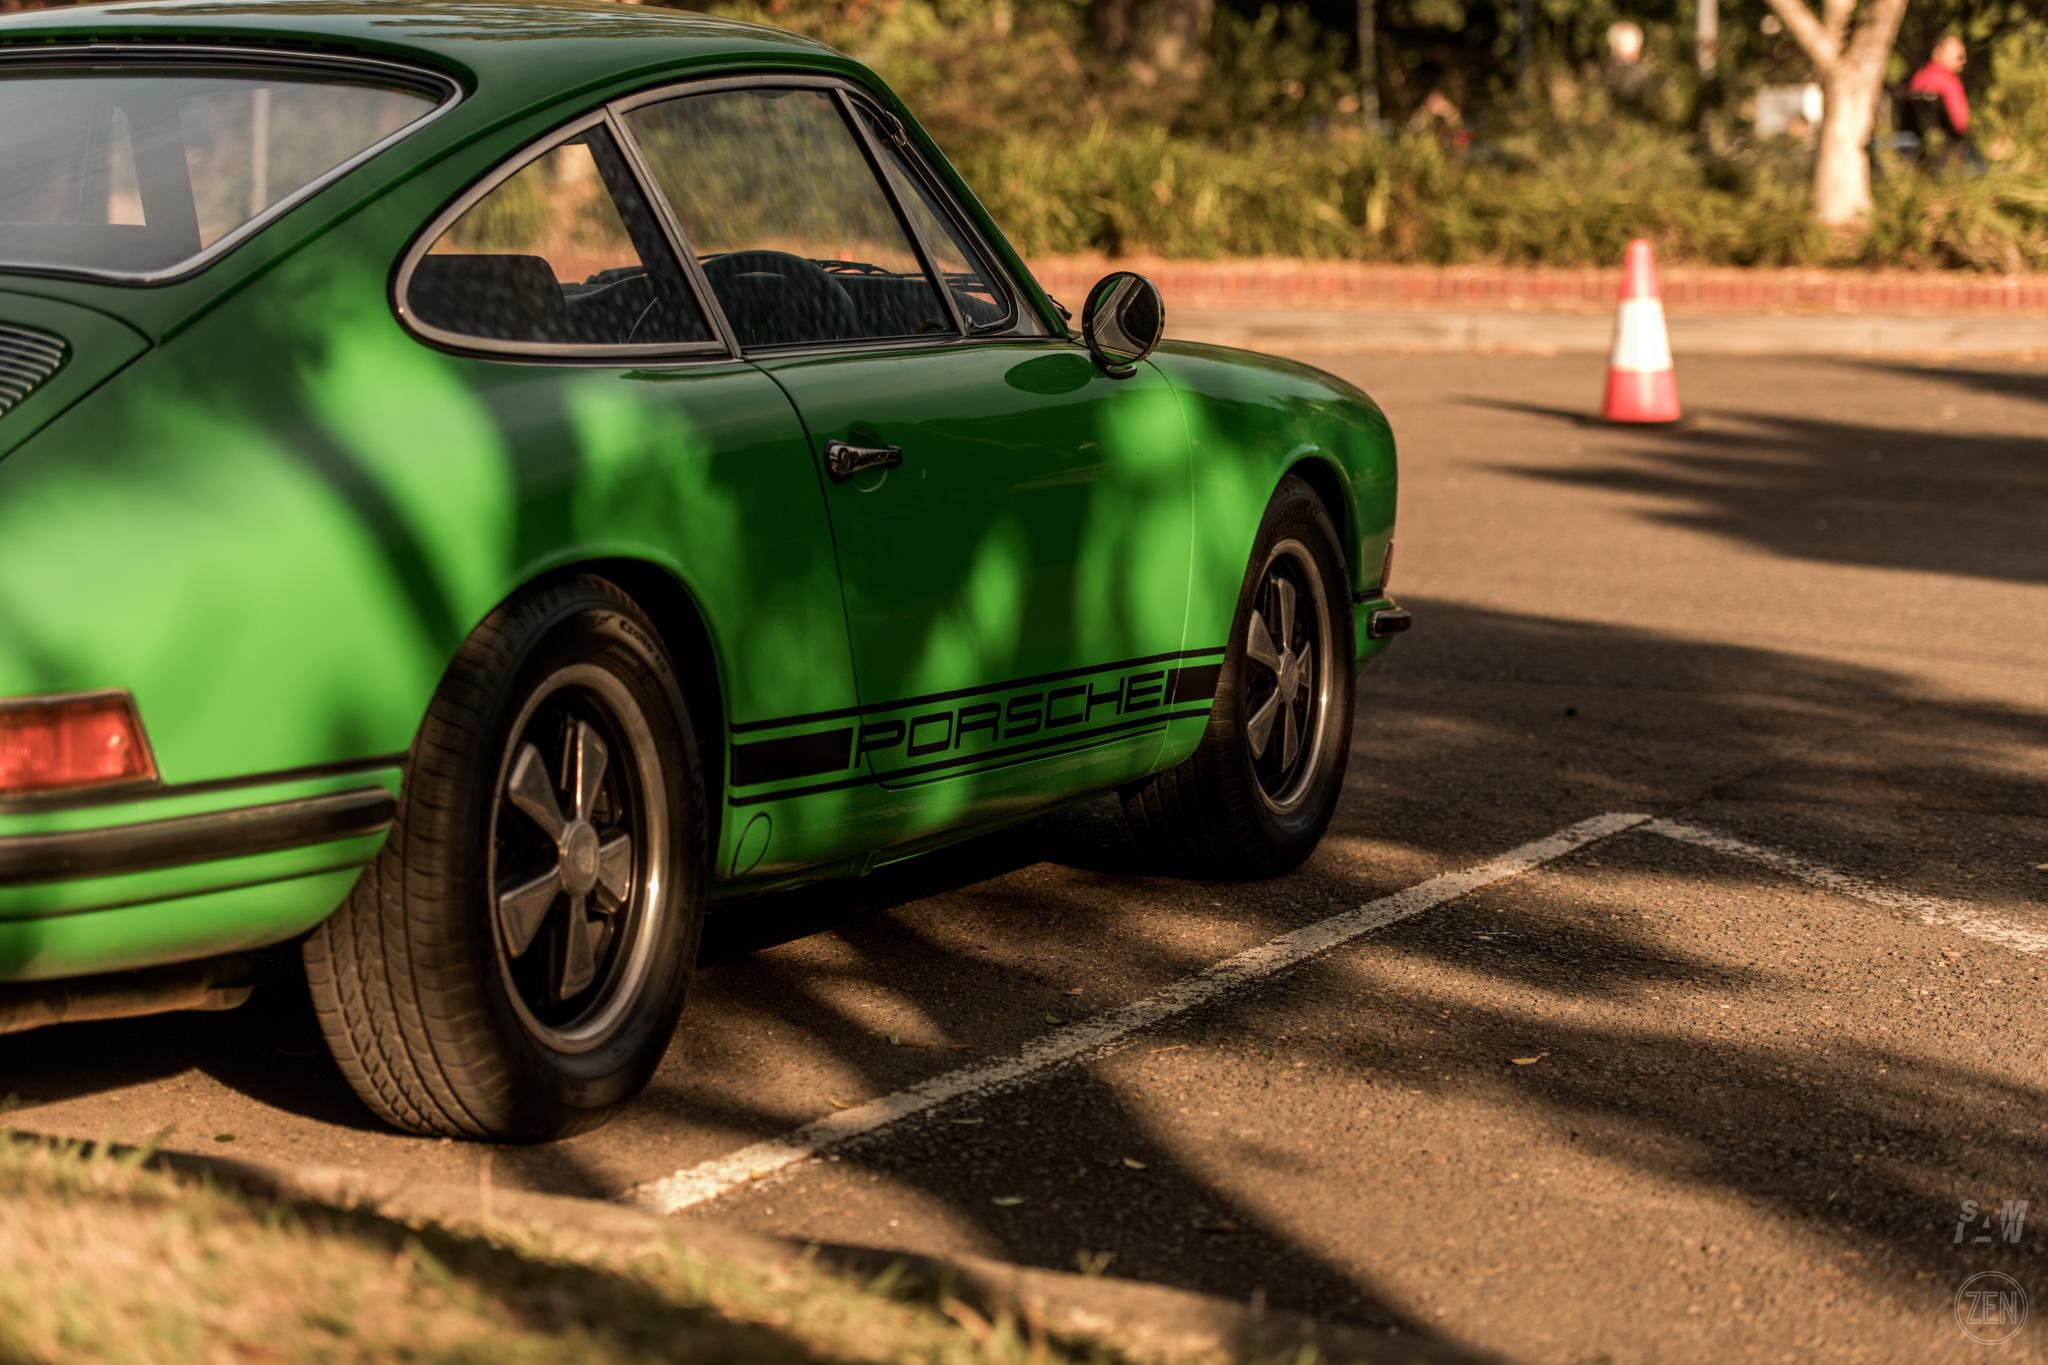 2019-10-27 - Autohaus Porsches & Coffee 106